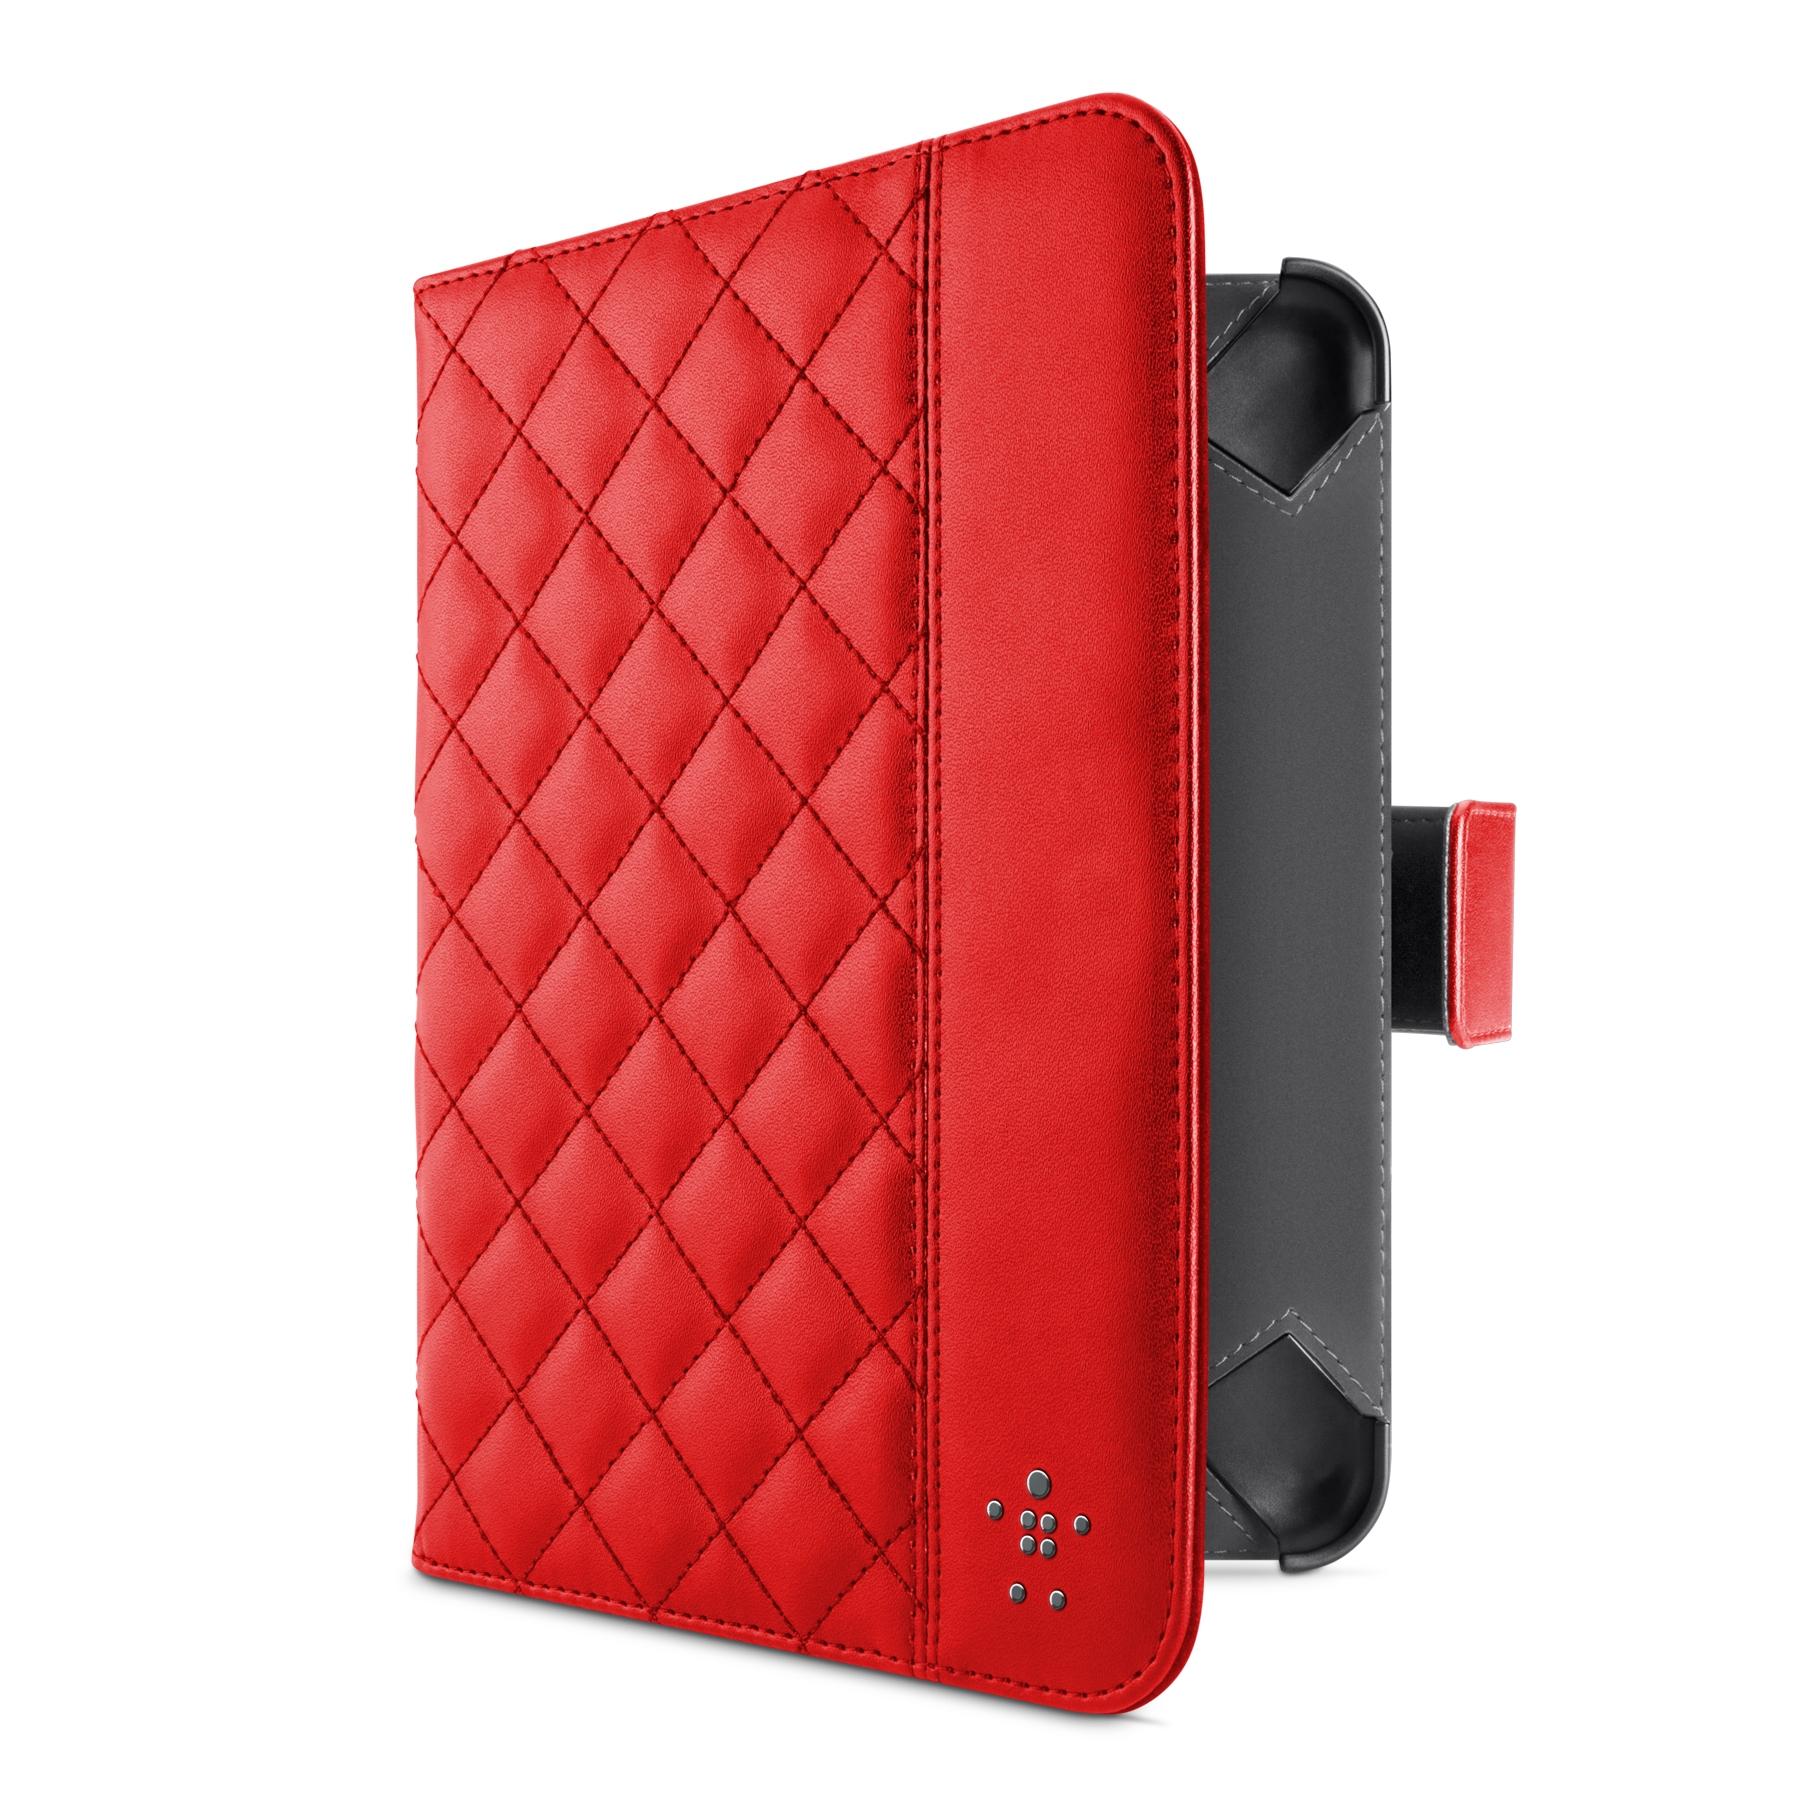 Belkin F8N890vf Cover Red